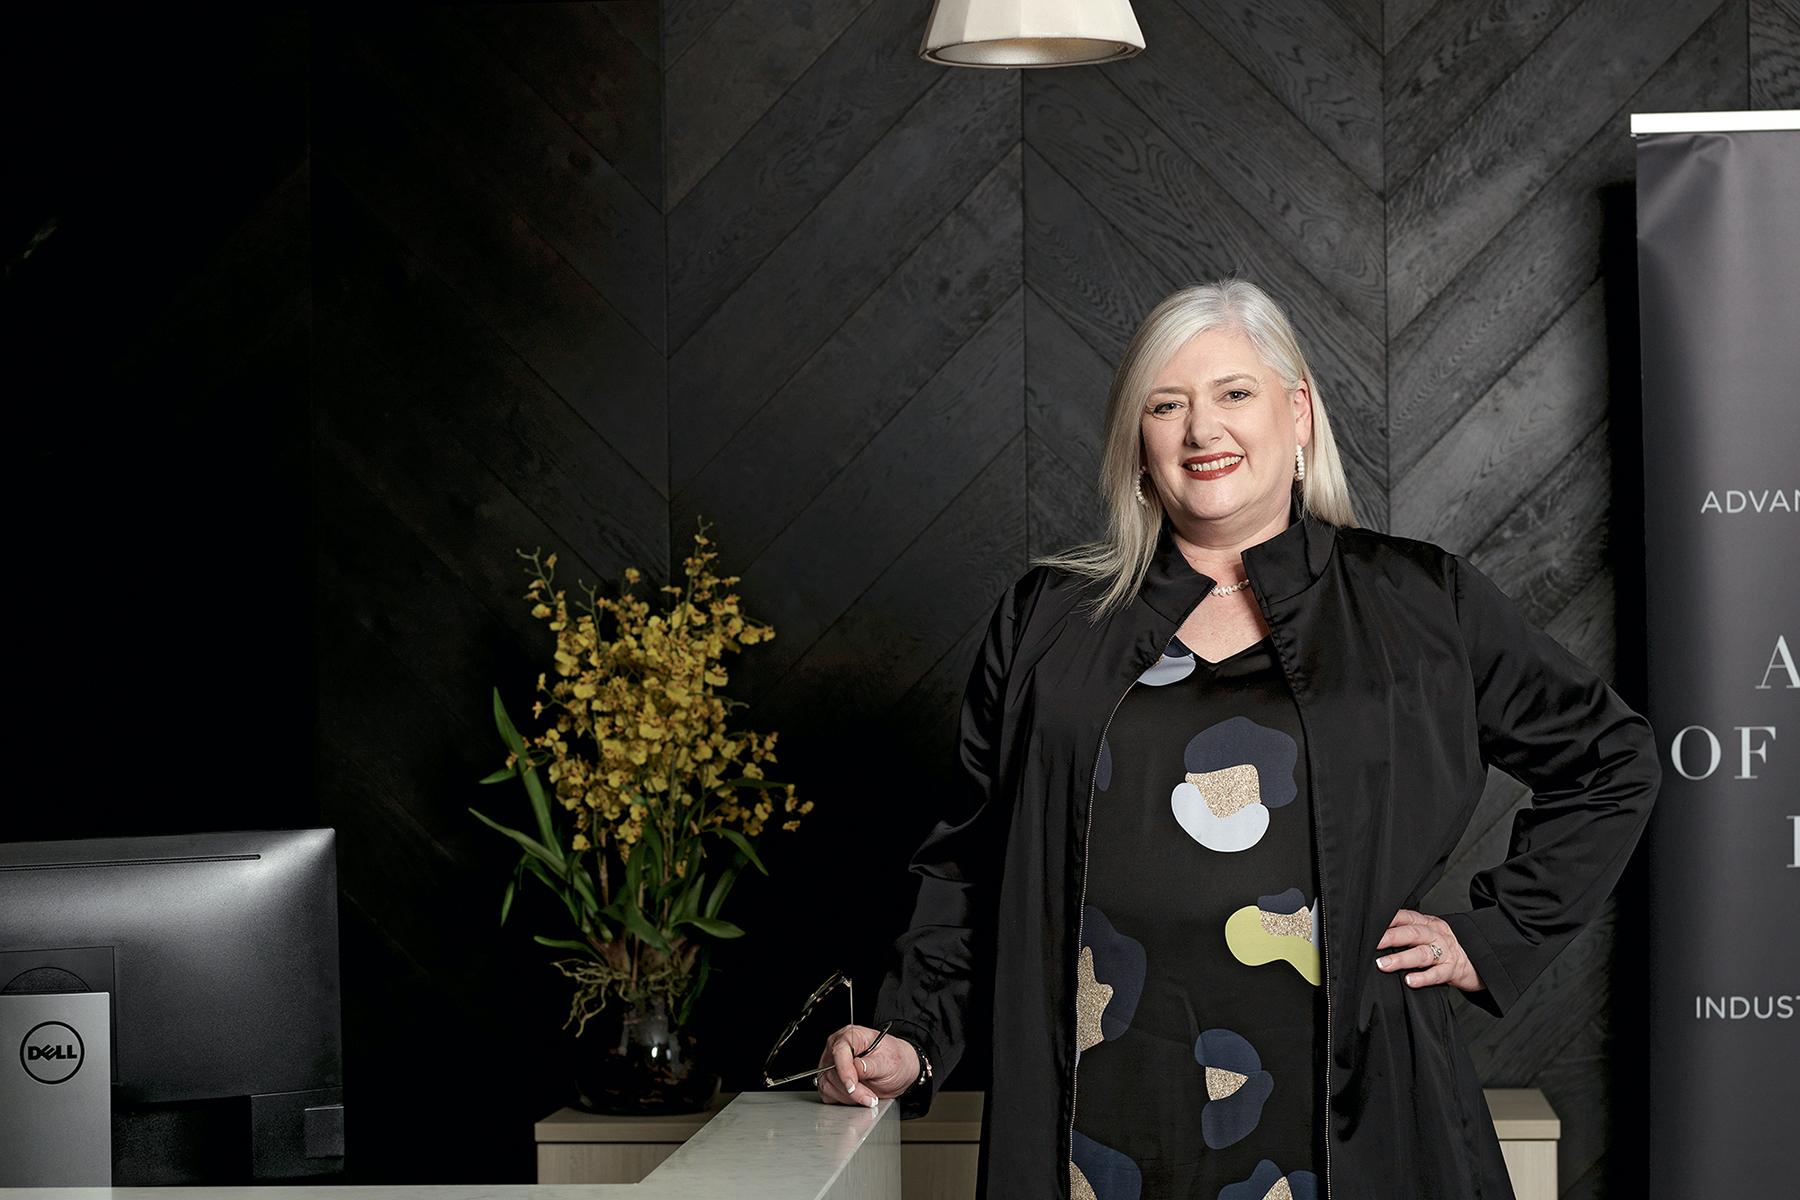 Heather Harrison, Managing Director of Advanced Skin Technology